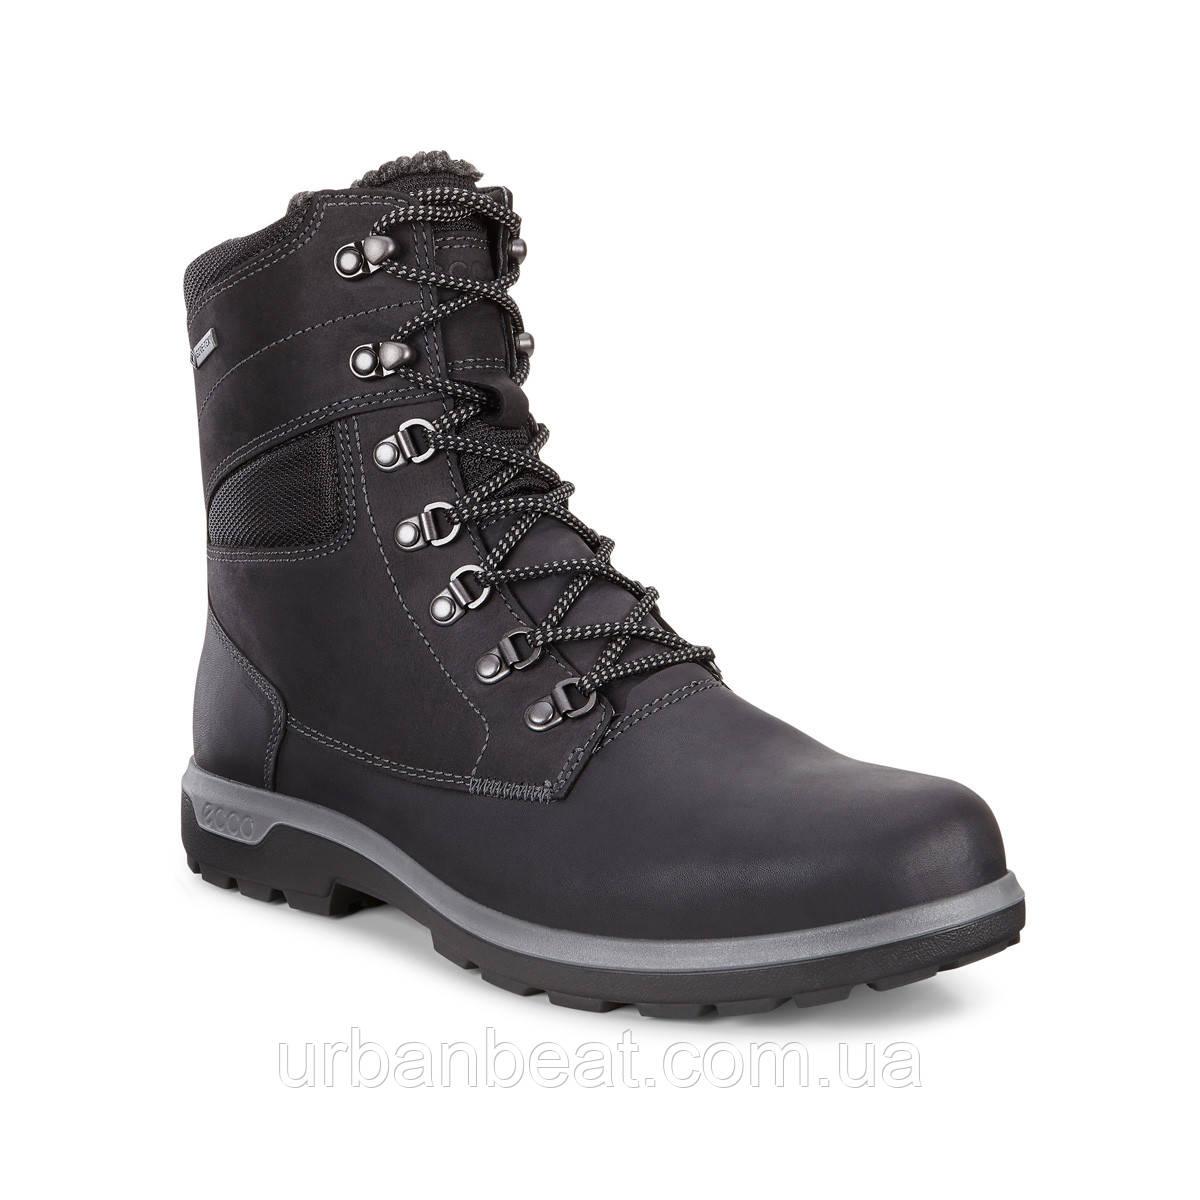 Мужские ботинки Ecco Whistler Gore-Tex 833654 51052 Оригинал , фото 1